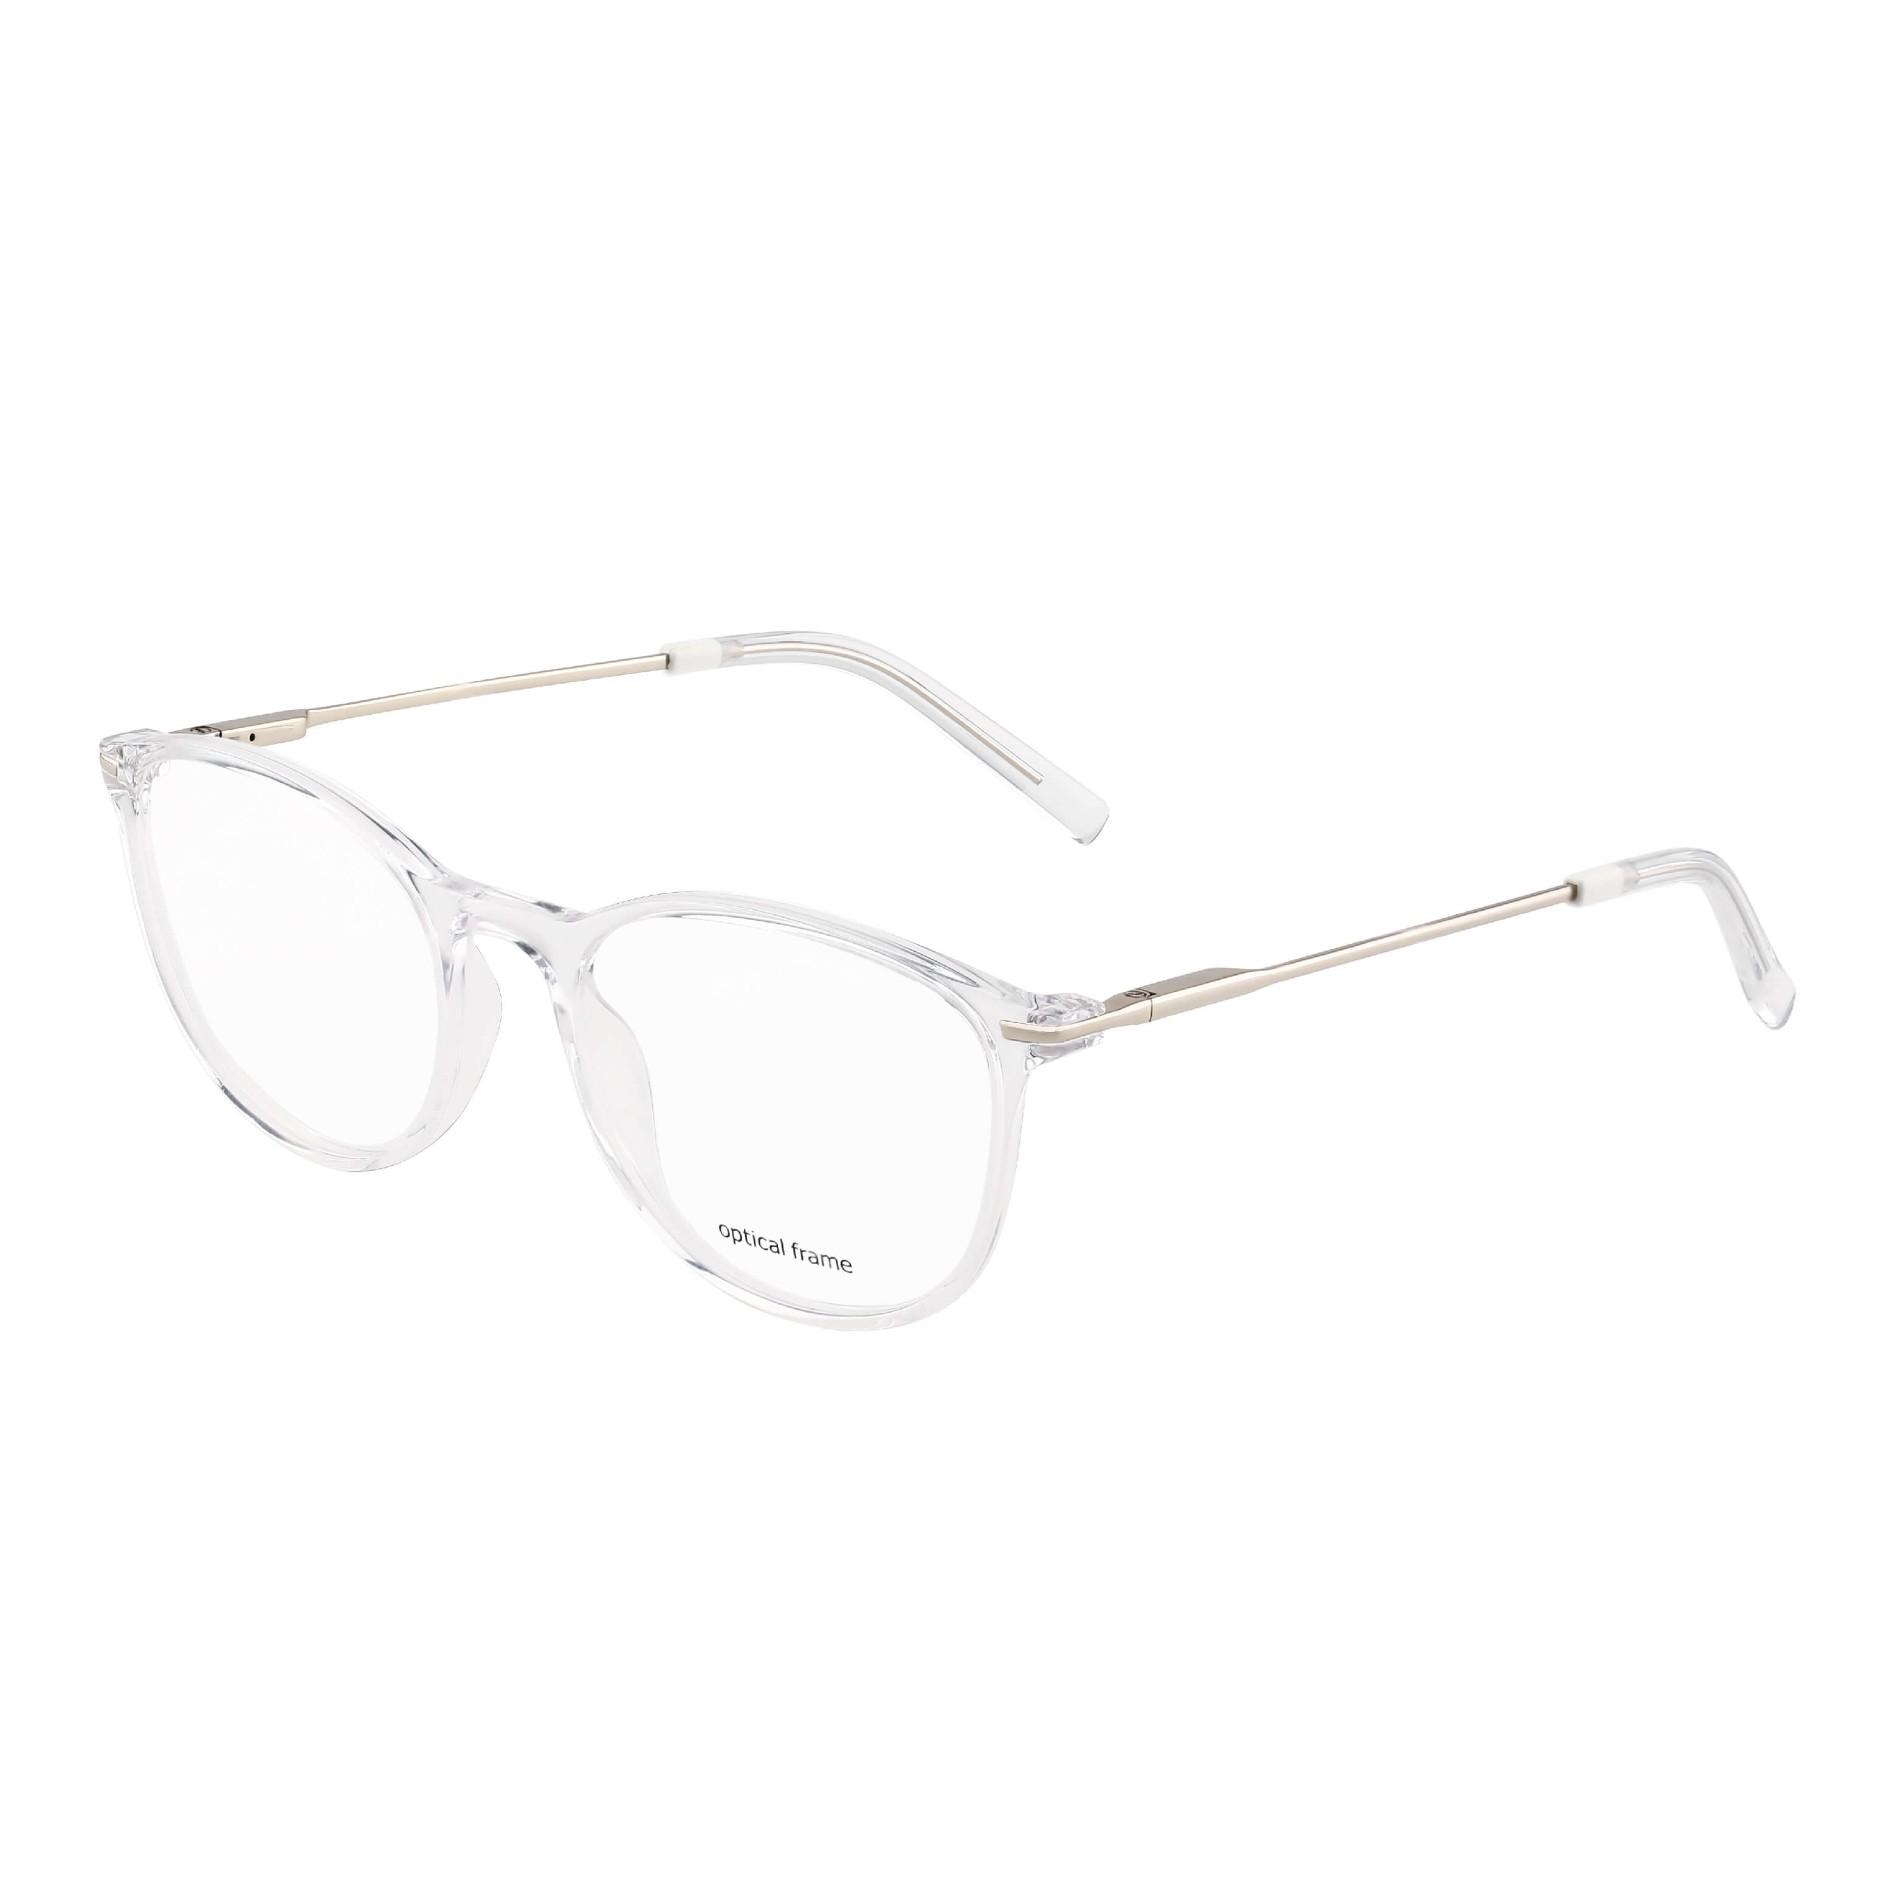 High Quality Unisex TR90 Optical Frames